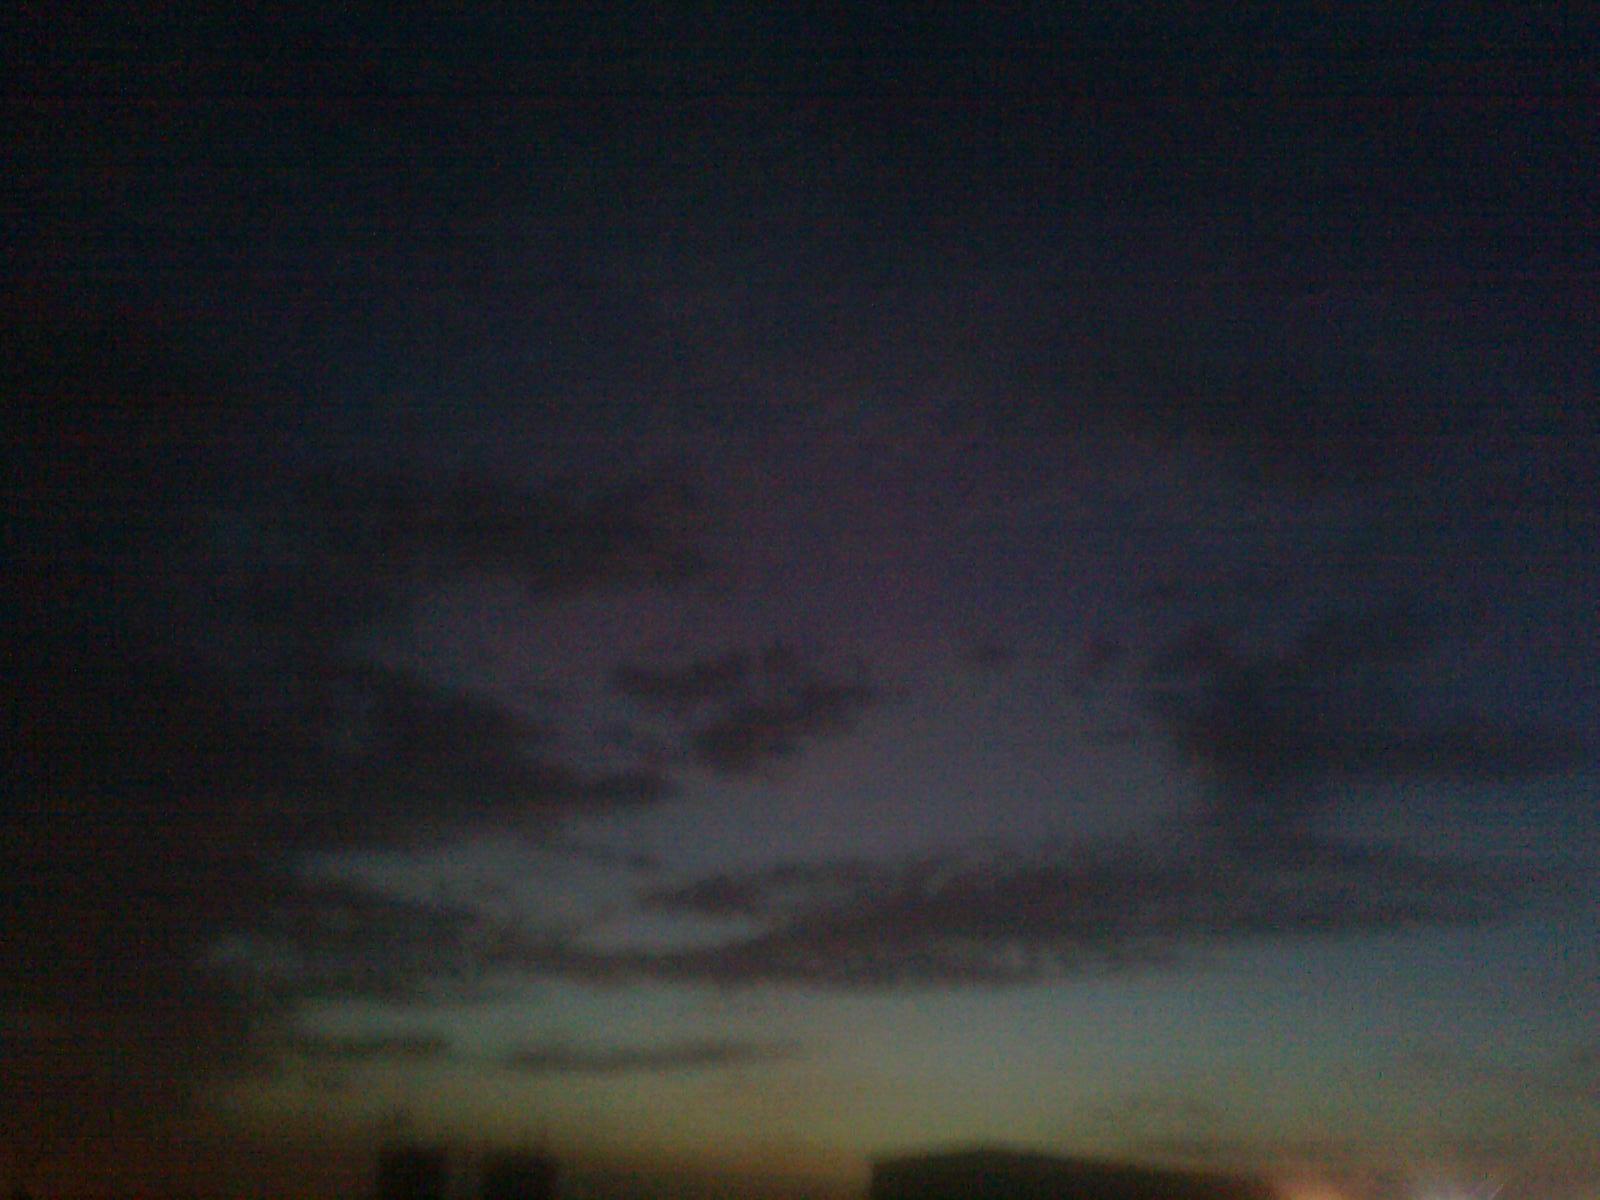 http://2.bp.blogspot.com/_NR-pTkG6FHE/TE2gJeORcvI/AAAAAAAAA5o/N7le_-thimA/s1600/From+nidhi0897.jpg